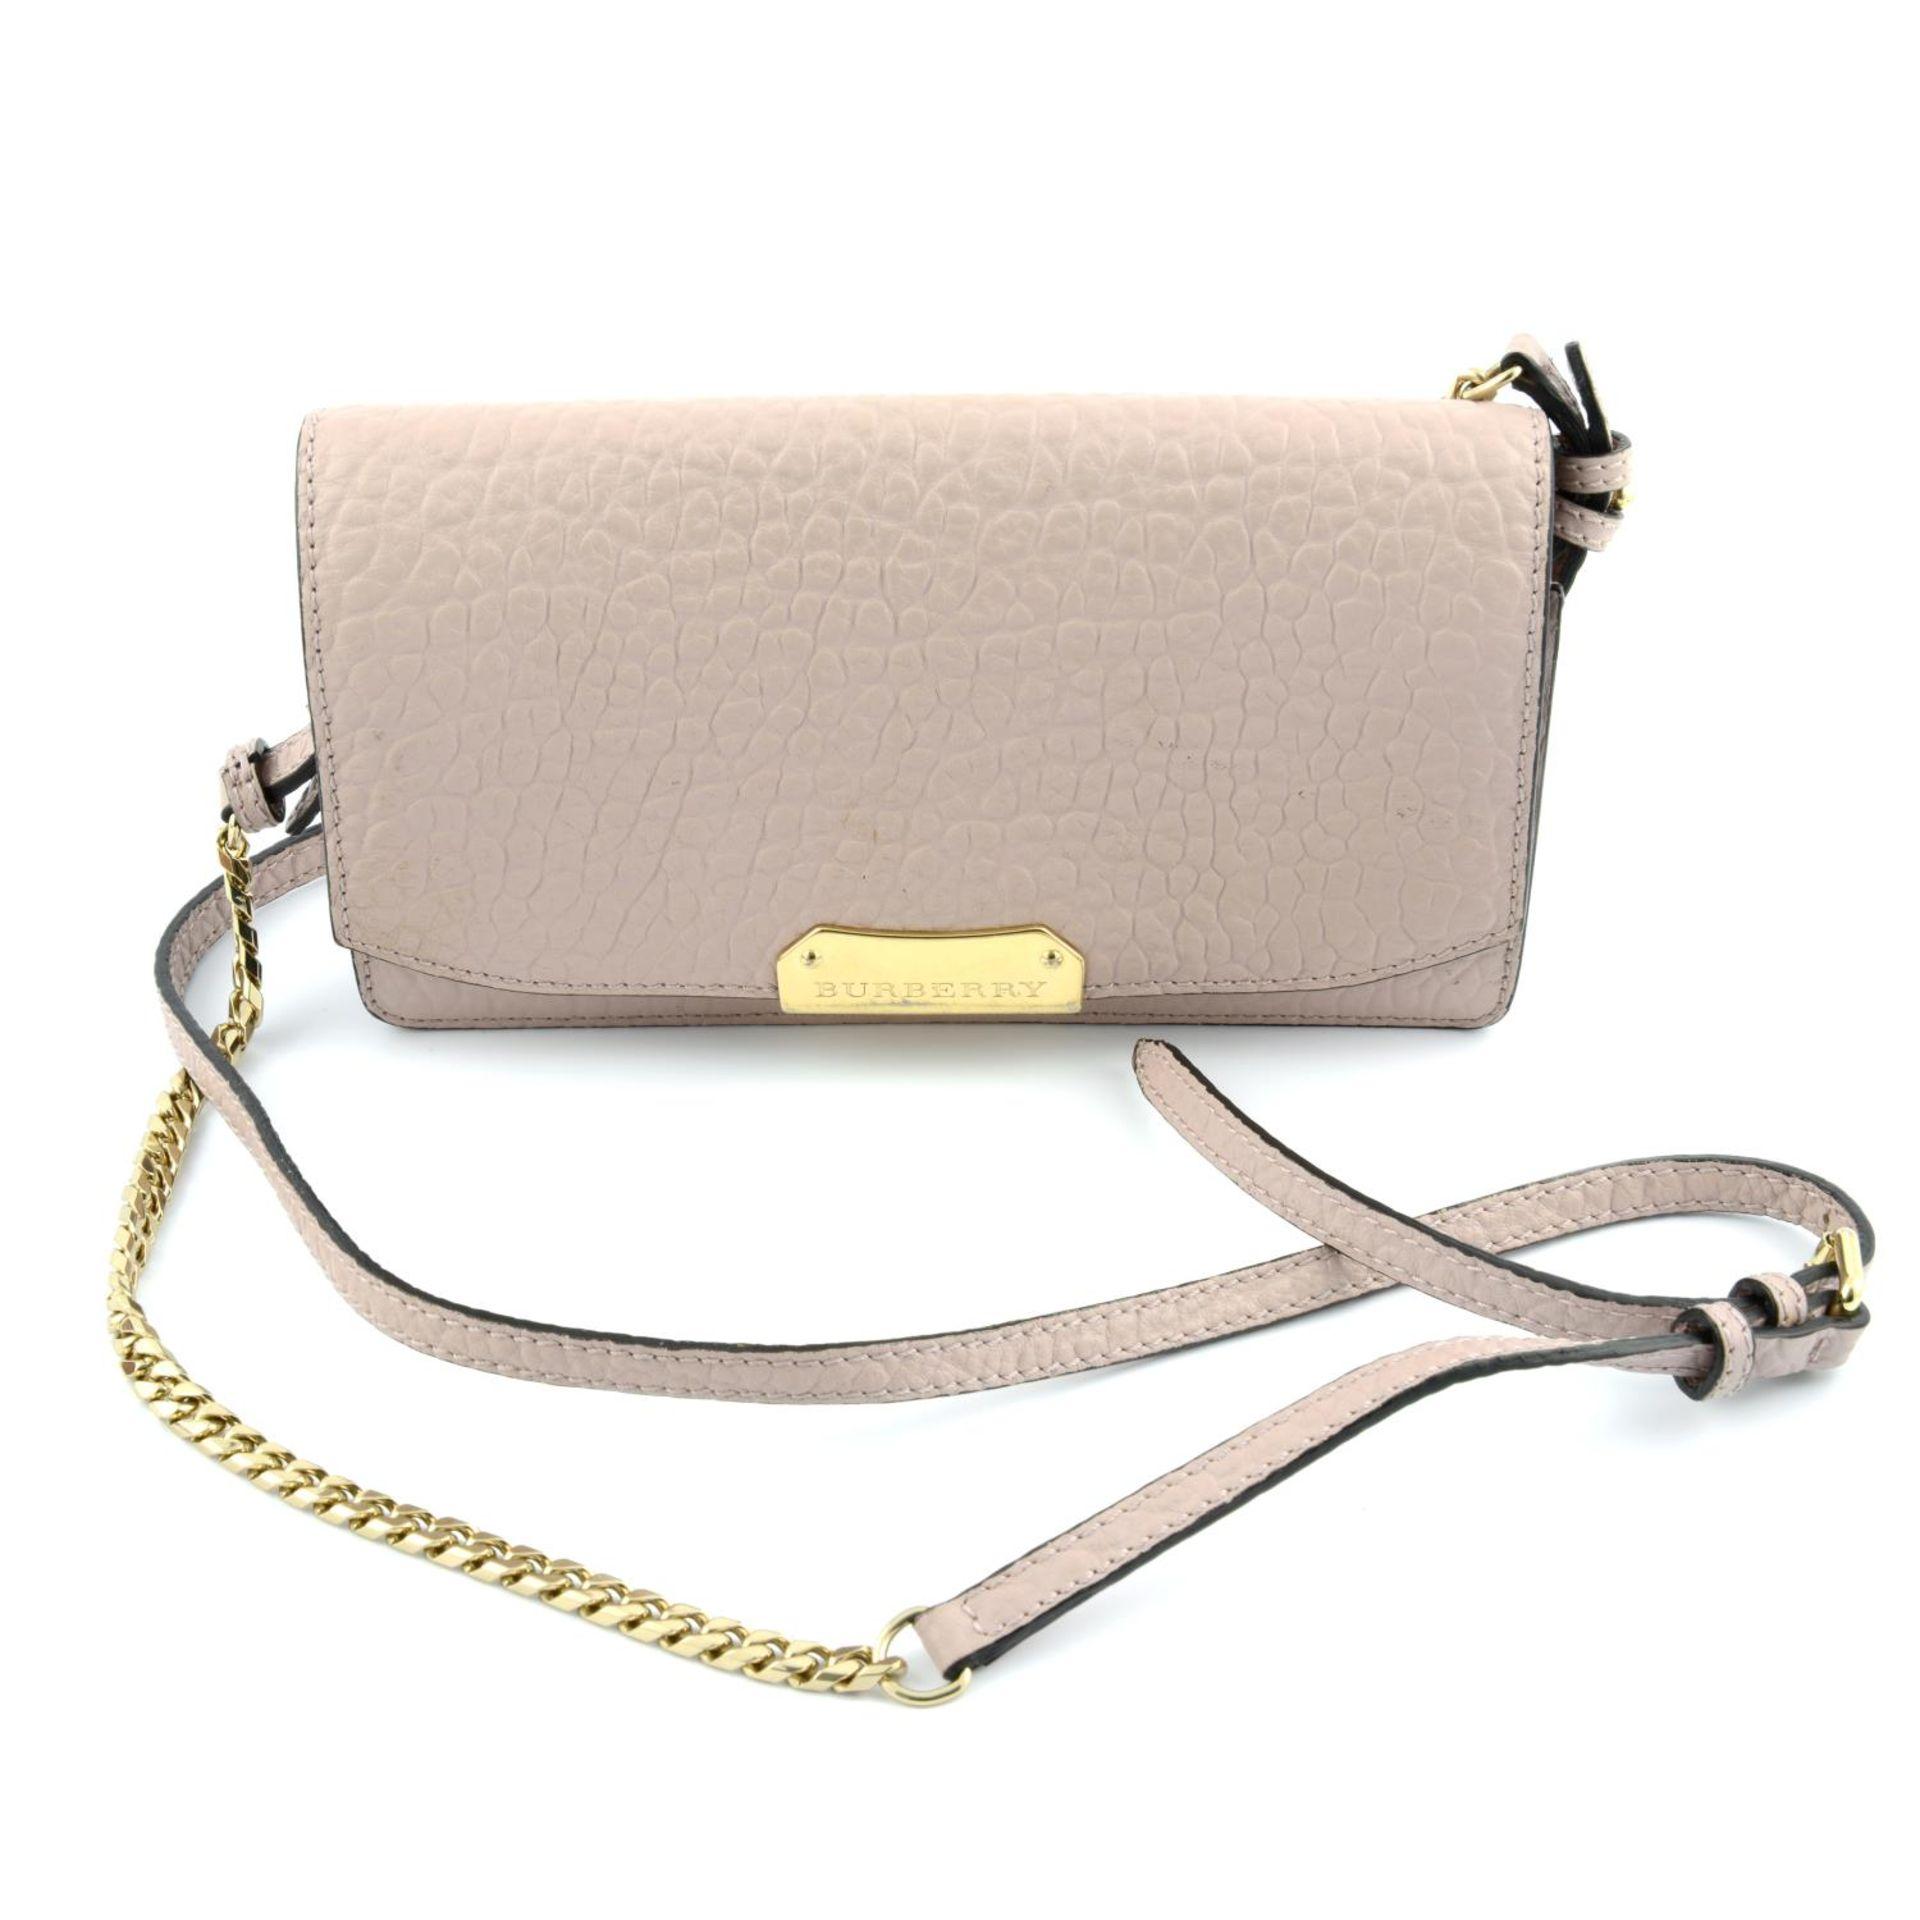 BURBERRY - pink Madison Wallet On Chain handbag. - Image 4 of 5